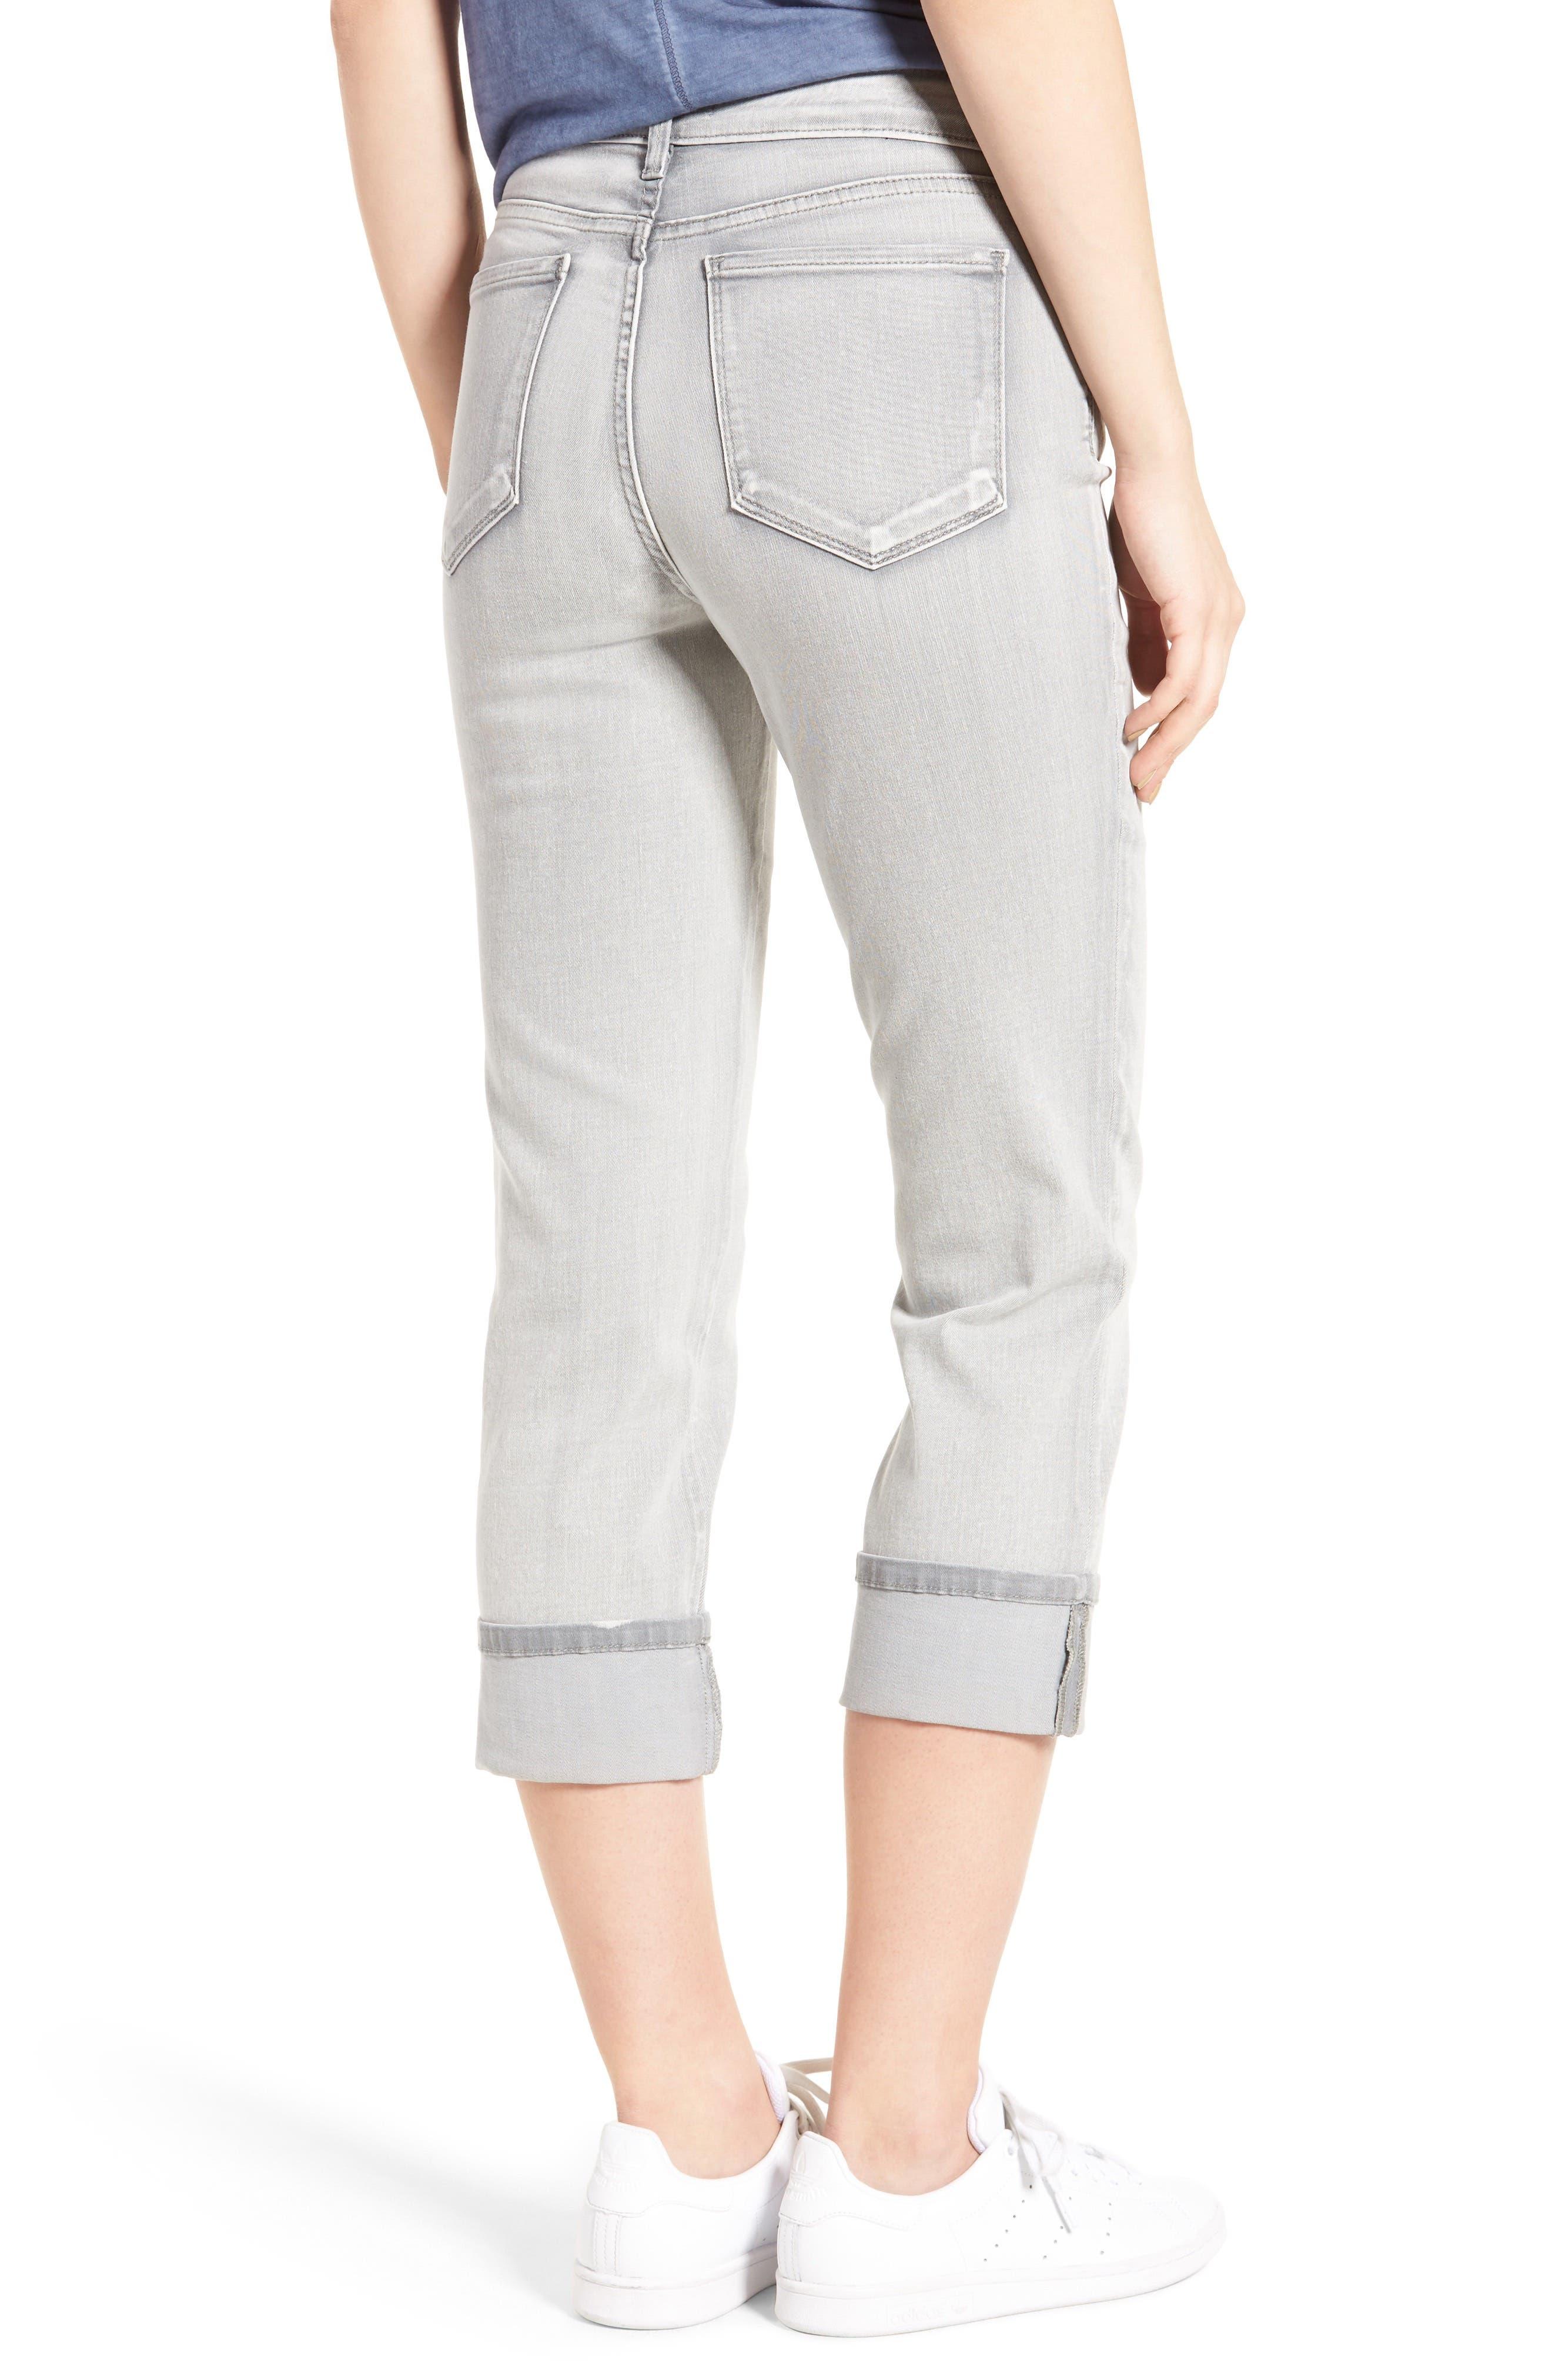 'Dayla' Colored Wide Cuff Capri Jeans,                             Alternate thumbnail 16, color,